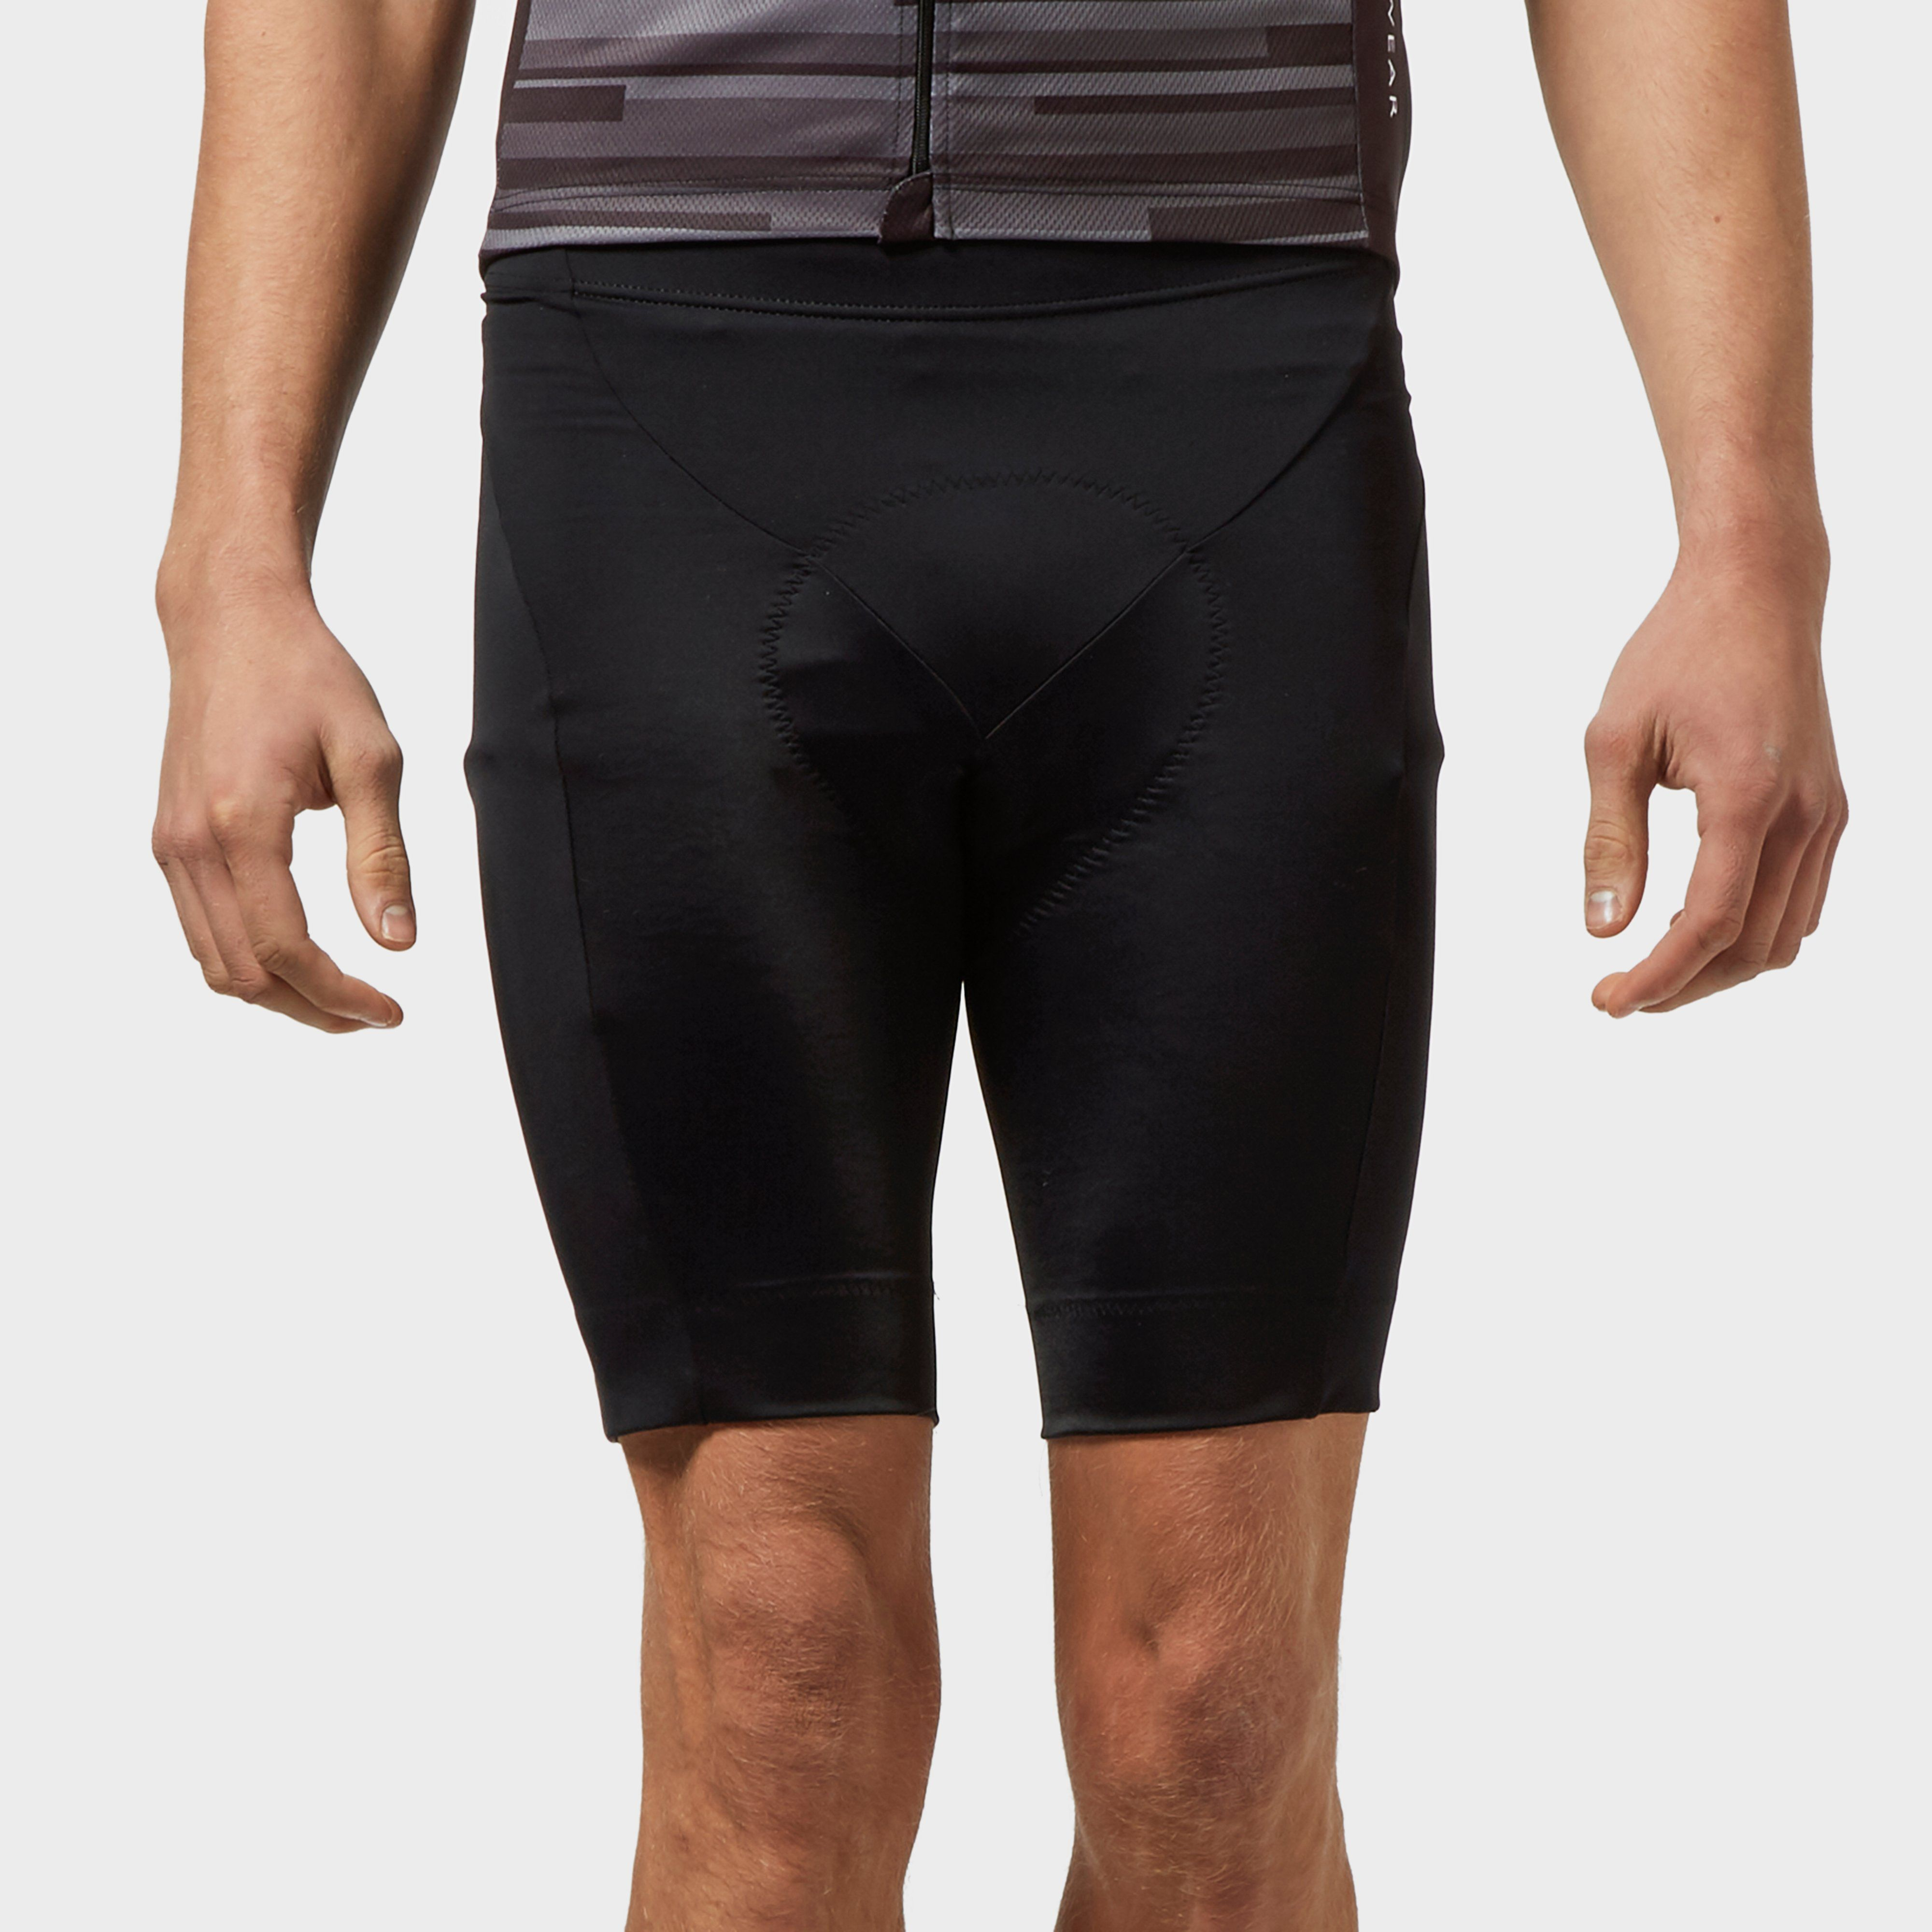 GORE Men's Element Tight Shorts